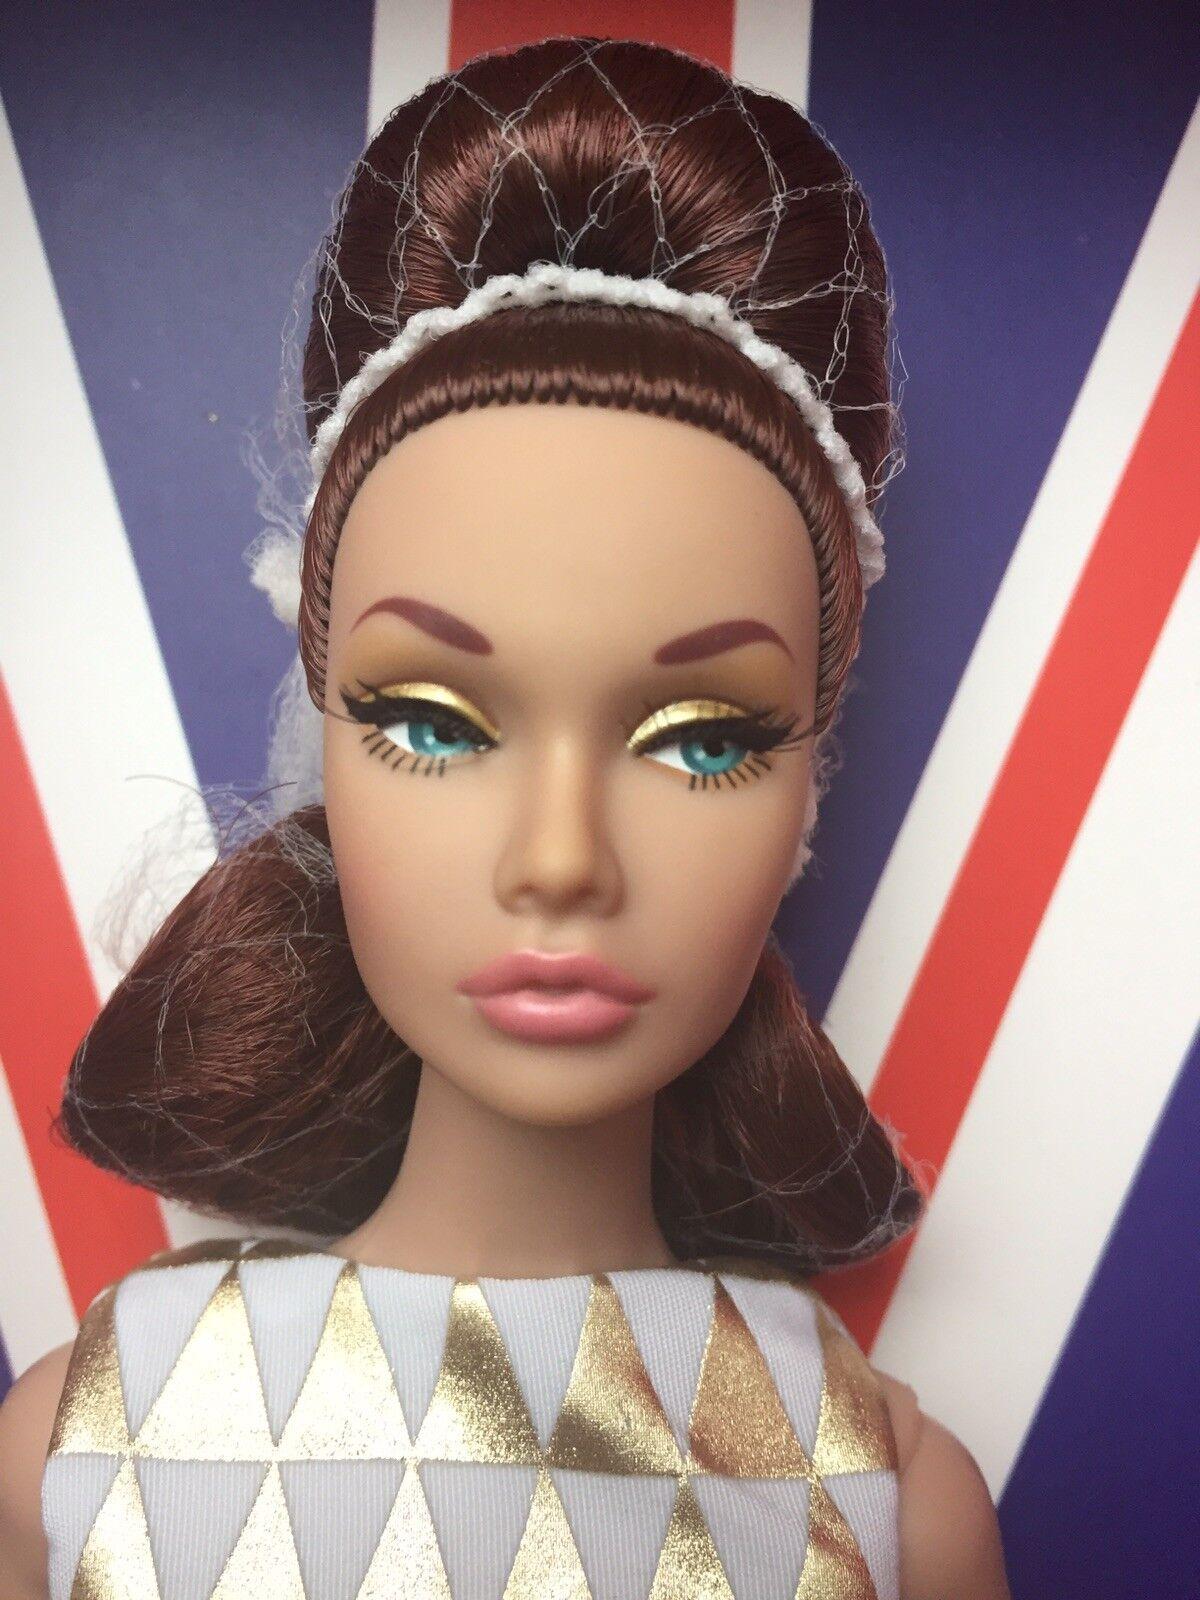 Integrità Fr D'Oro Vacanza Poppy Parker Bambola Swinging London Moda Royalty Le